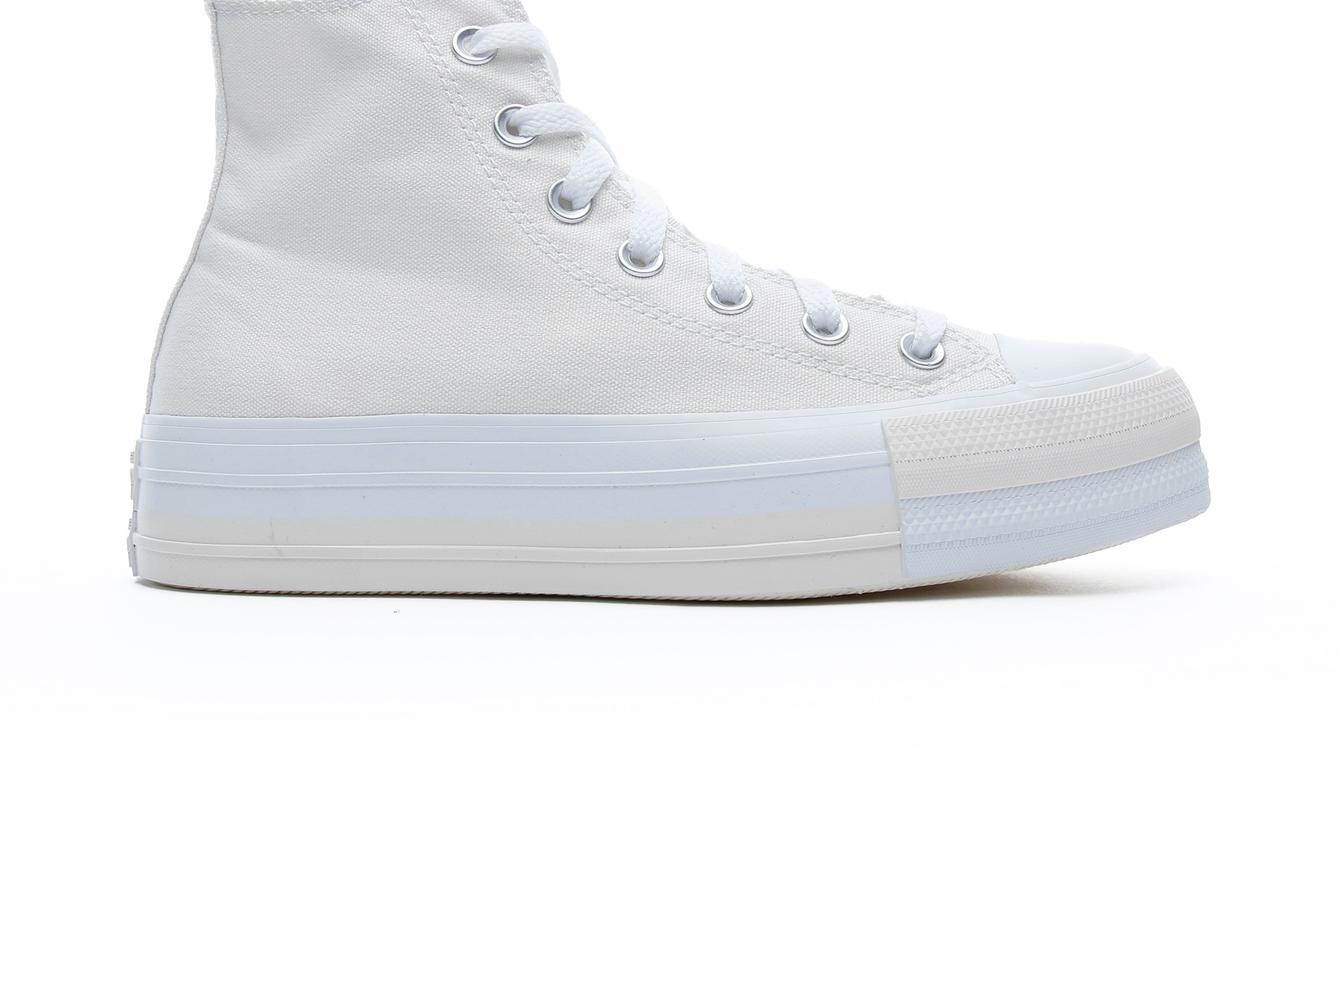 Chuck Taylor All Star Double Stack Lift Hi Kadın Beyaz Sneaker